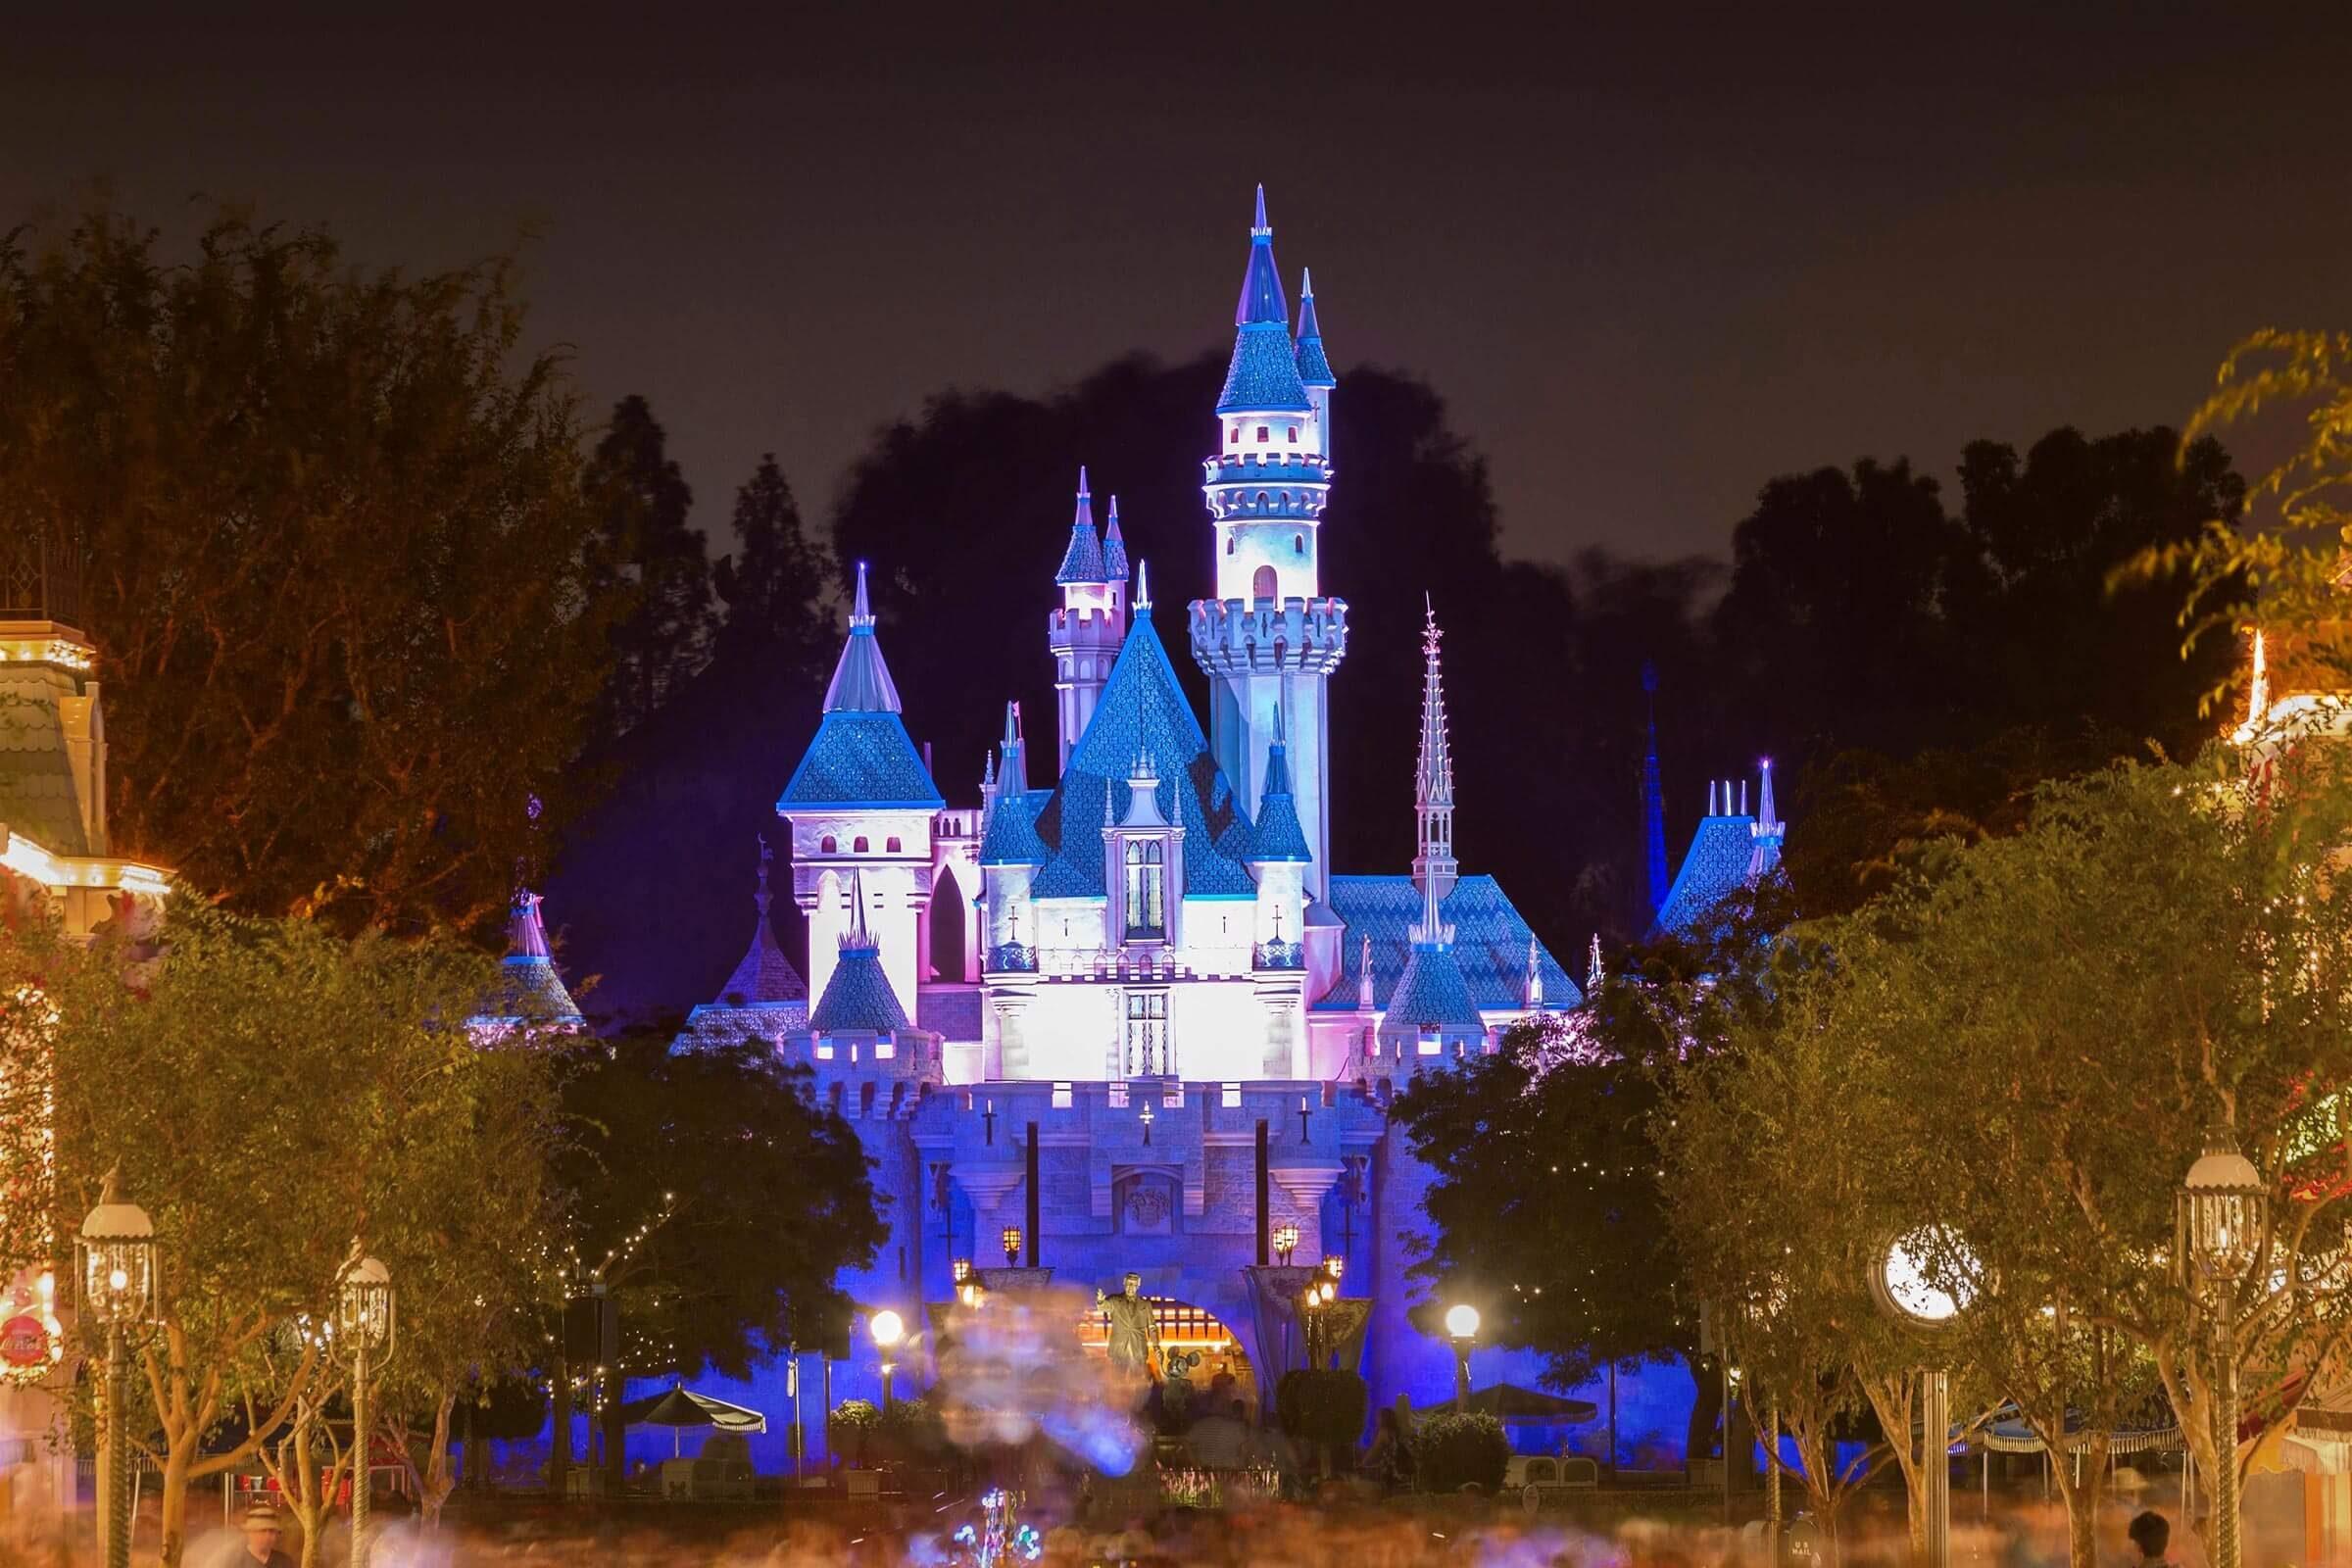 Sleeping Beauty Castle by night, Disneyland Park, Disneyland Resort, Anaheim, California, USA